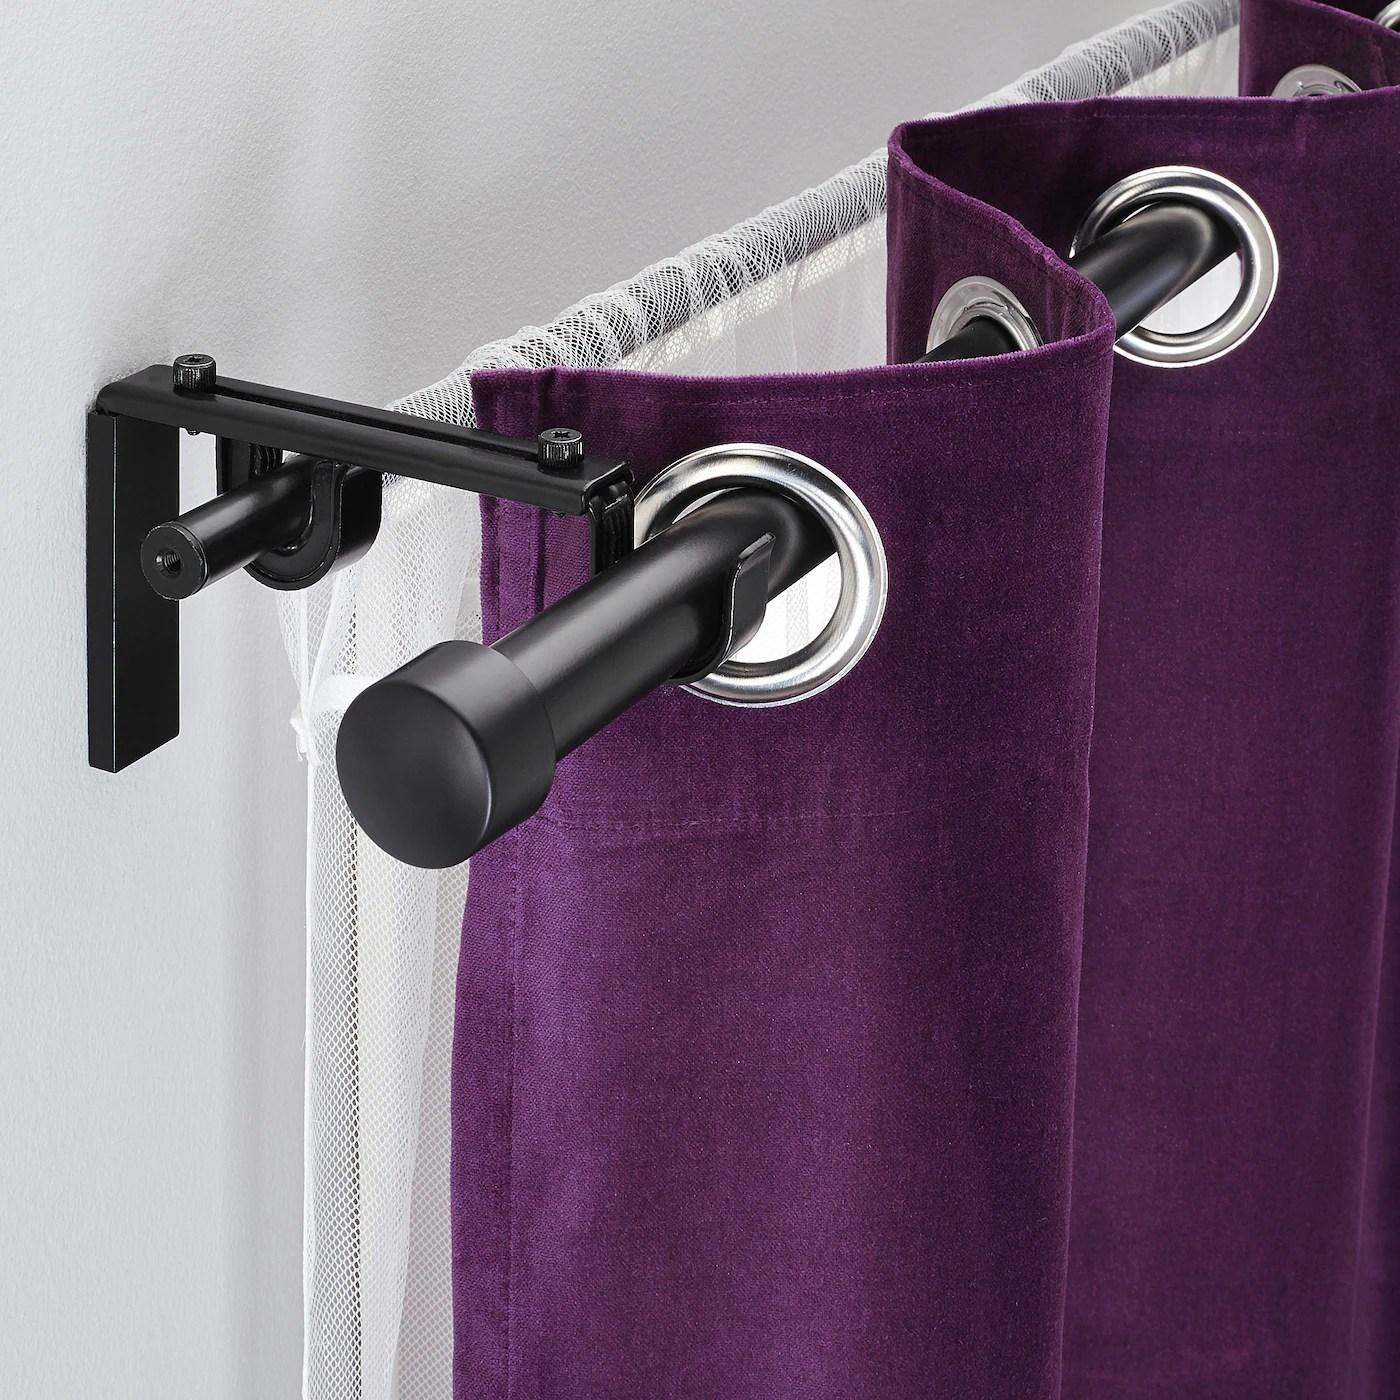 racka hugad double curtain rod combination black 82 5 8 151 5 8